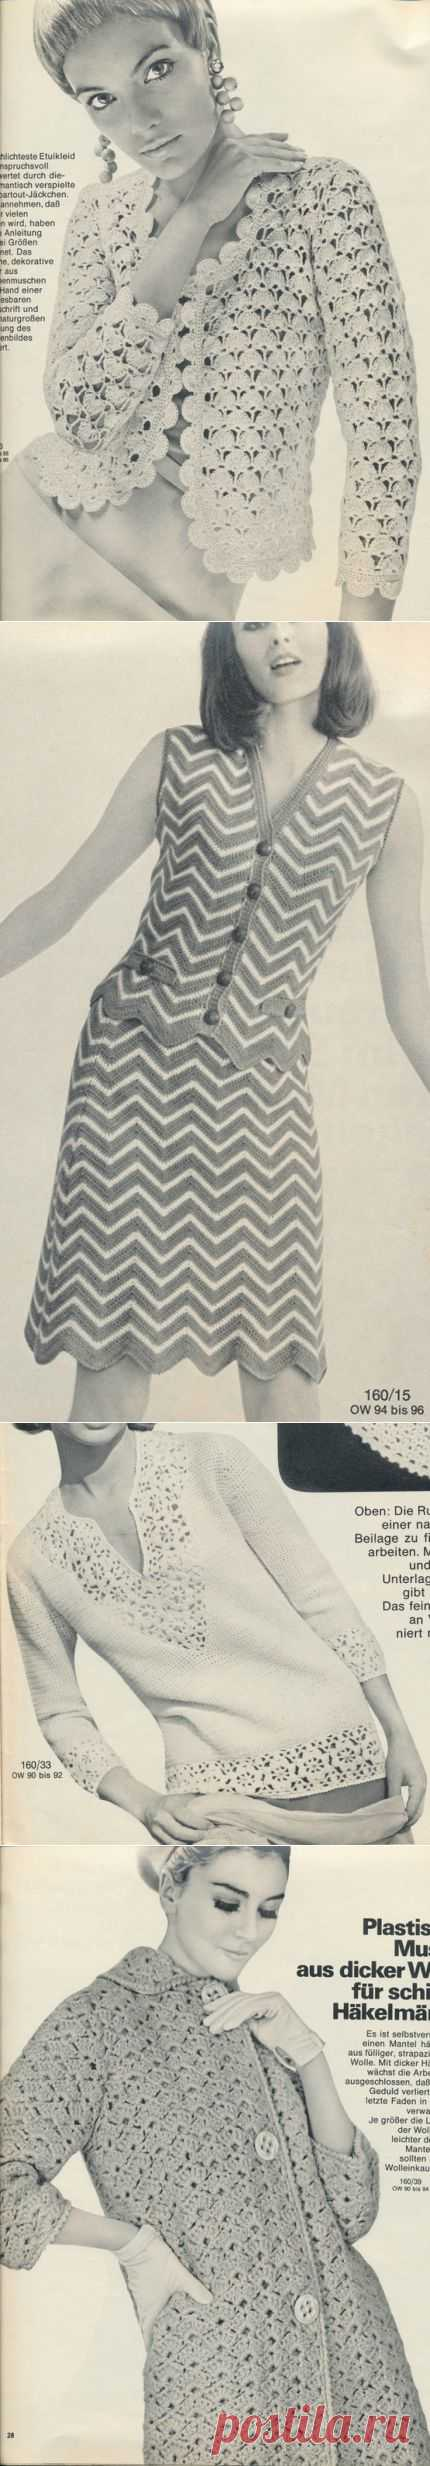 BURDA 160-Zhensky summer clothes hook.